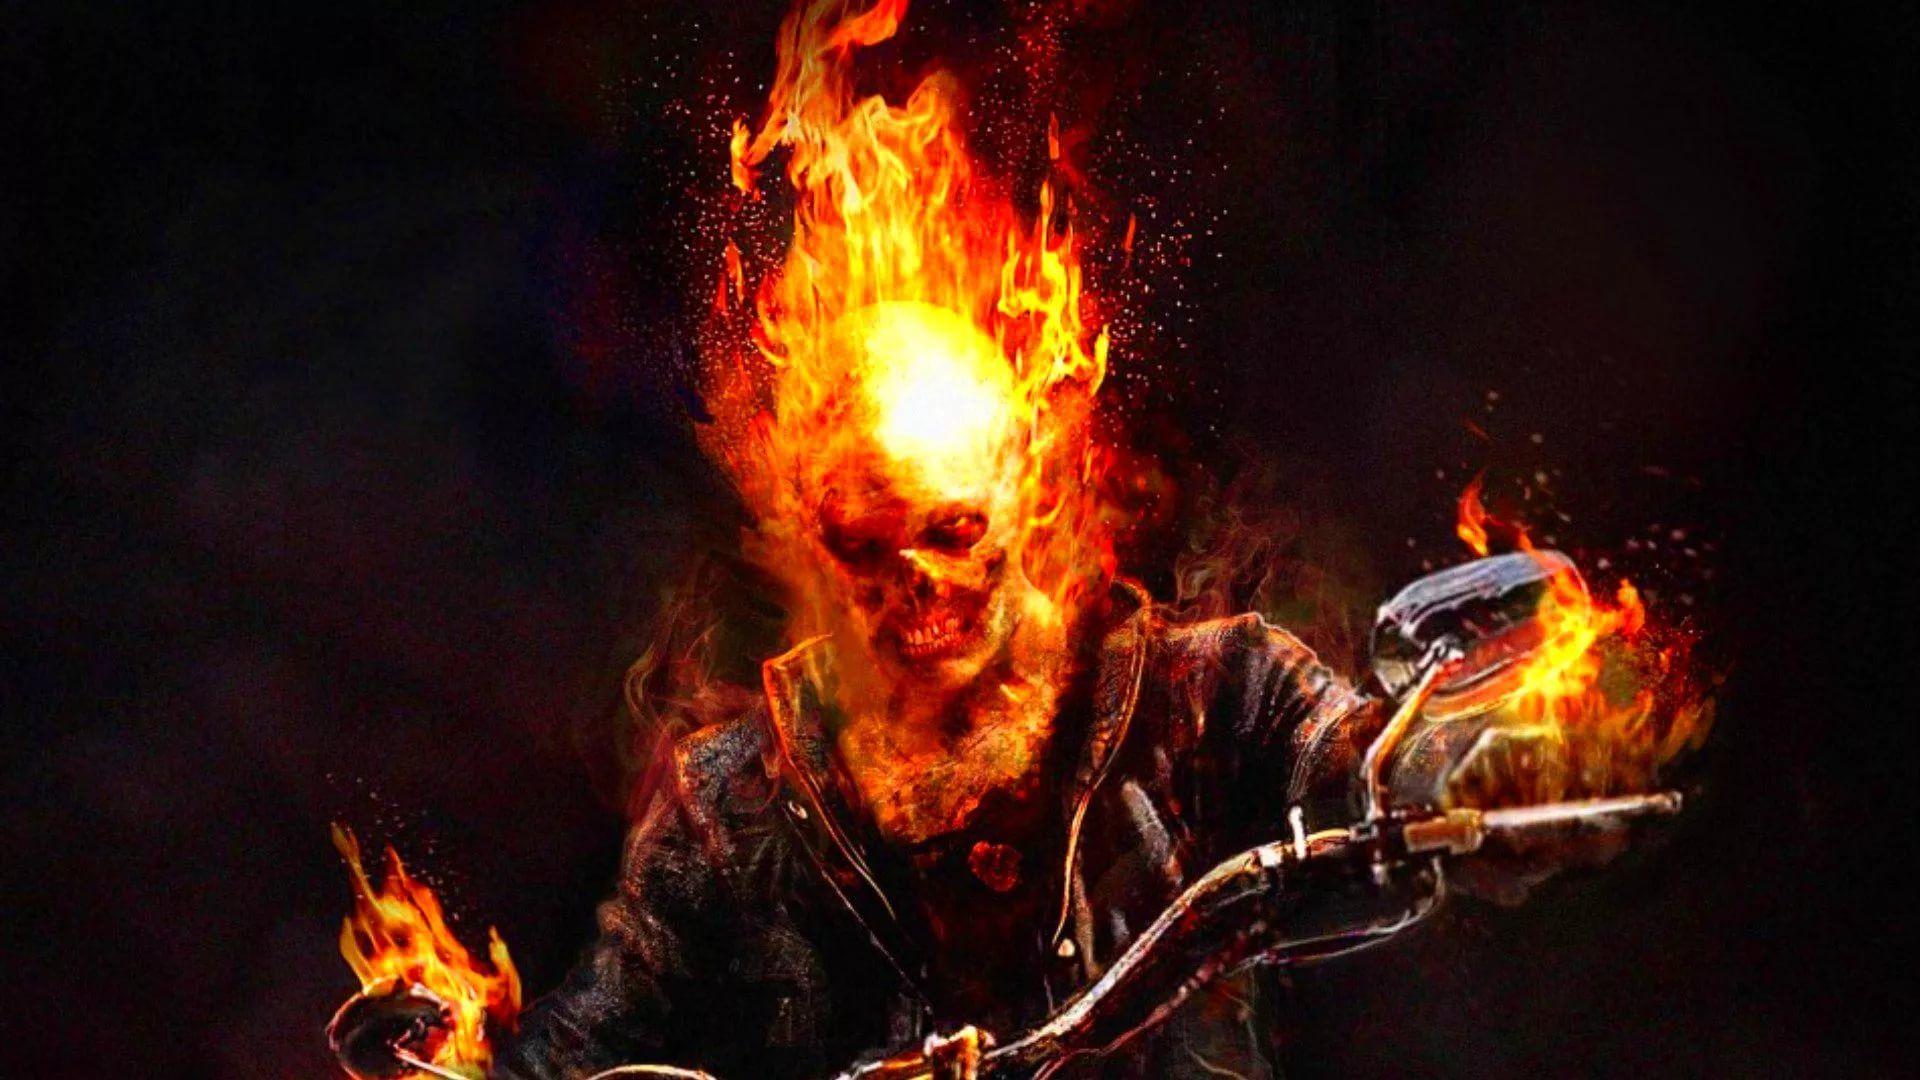 Flaming Skull hd wallpaper download